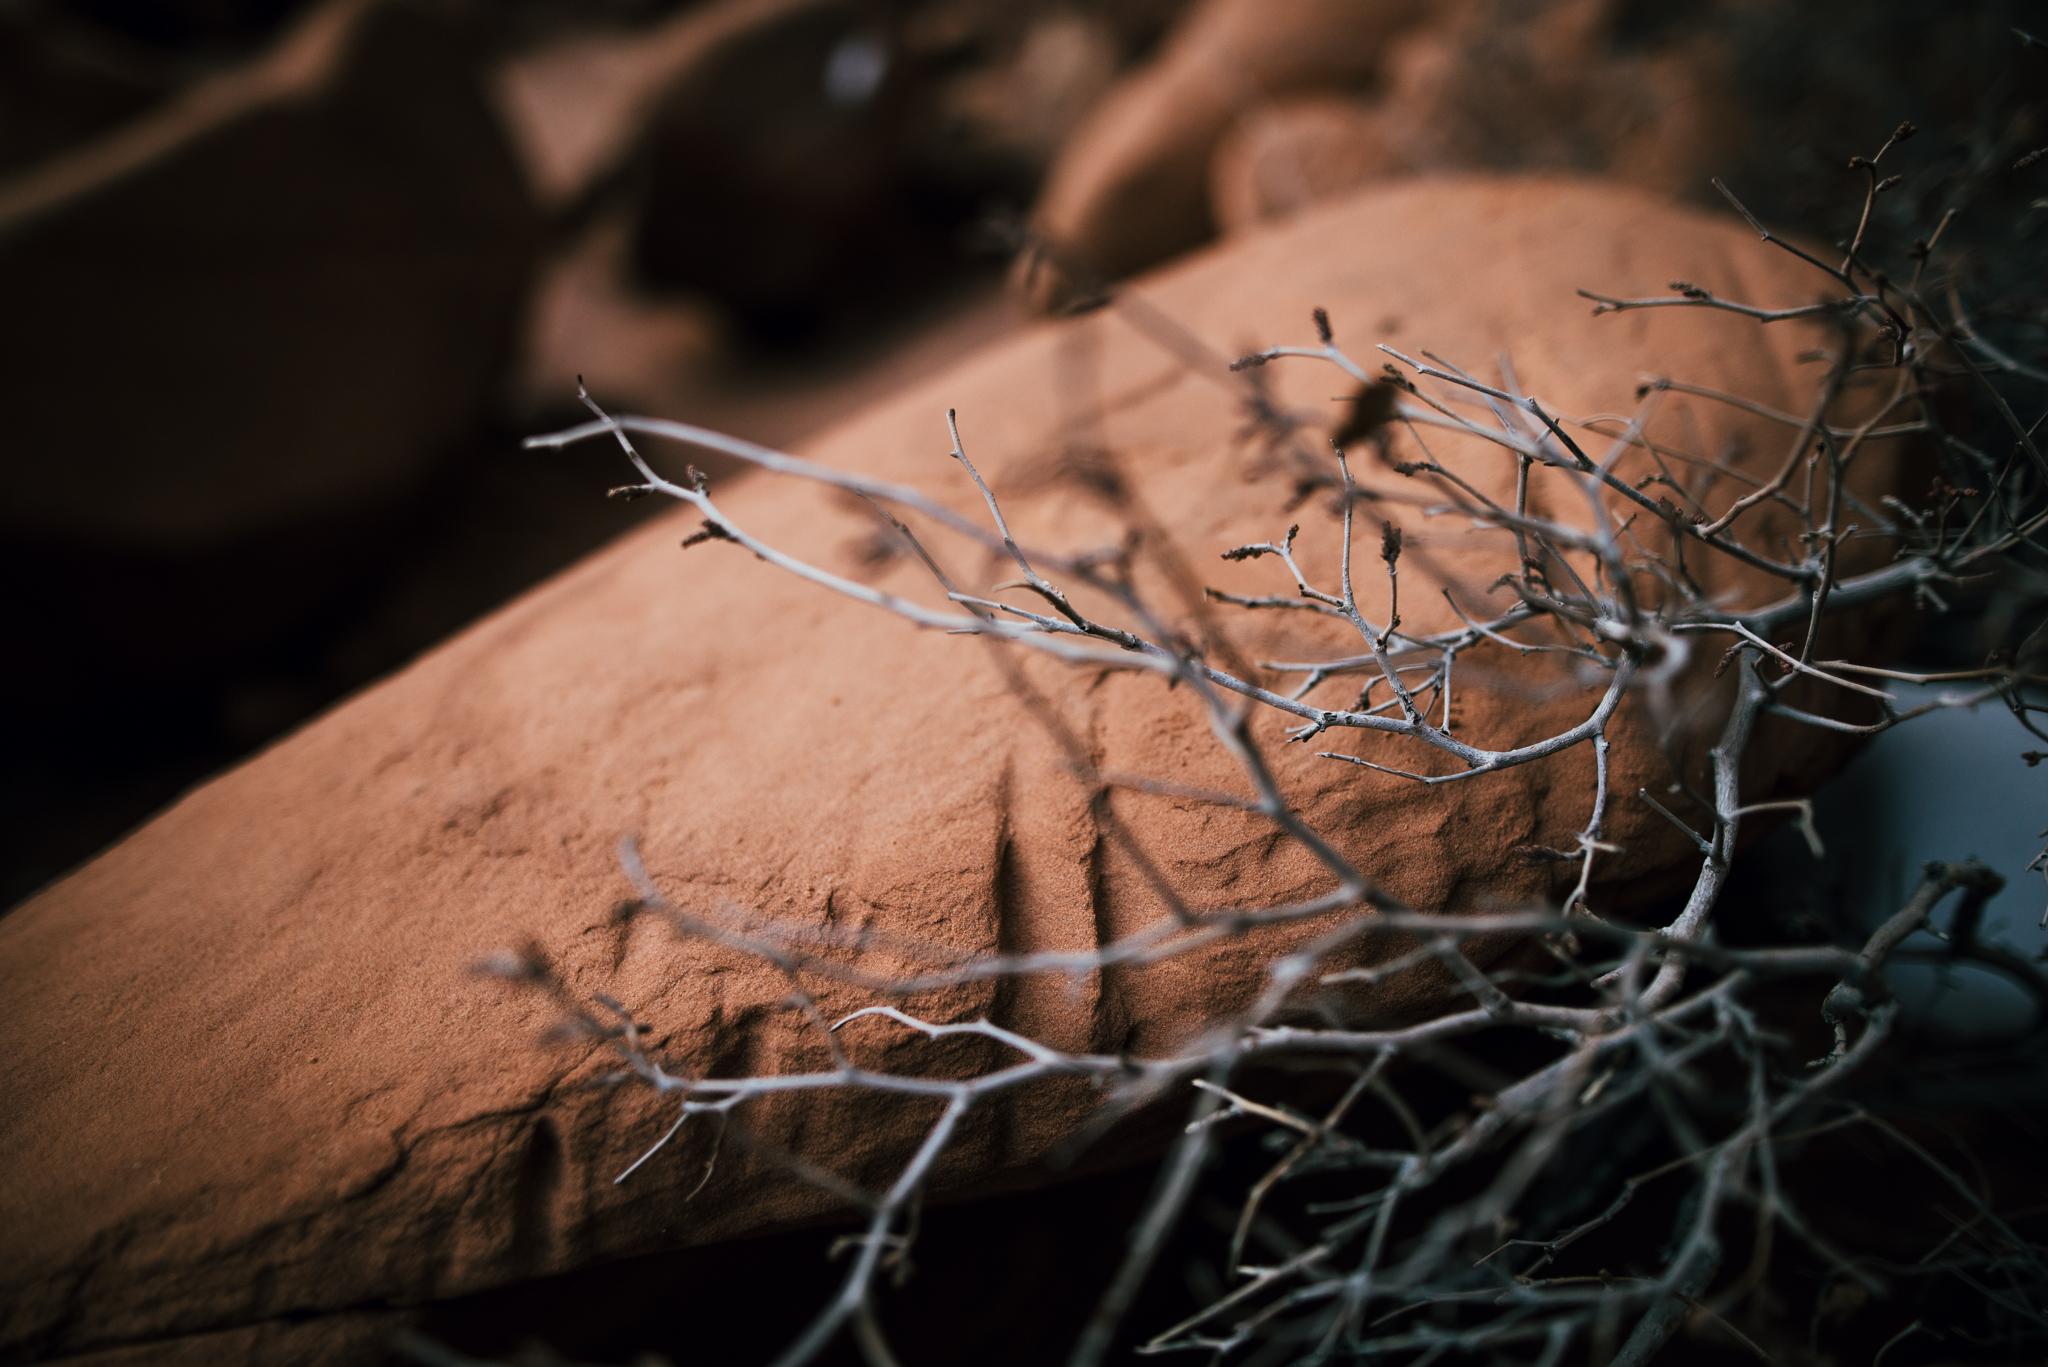 ©The-Ryans-Photography---Arches-National-Park-Moab-Utah-Travel-020.jpg